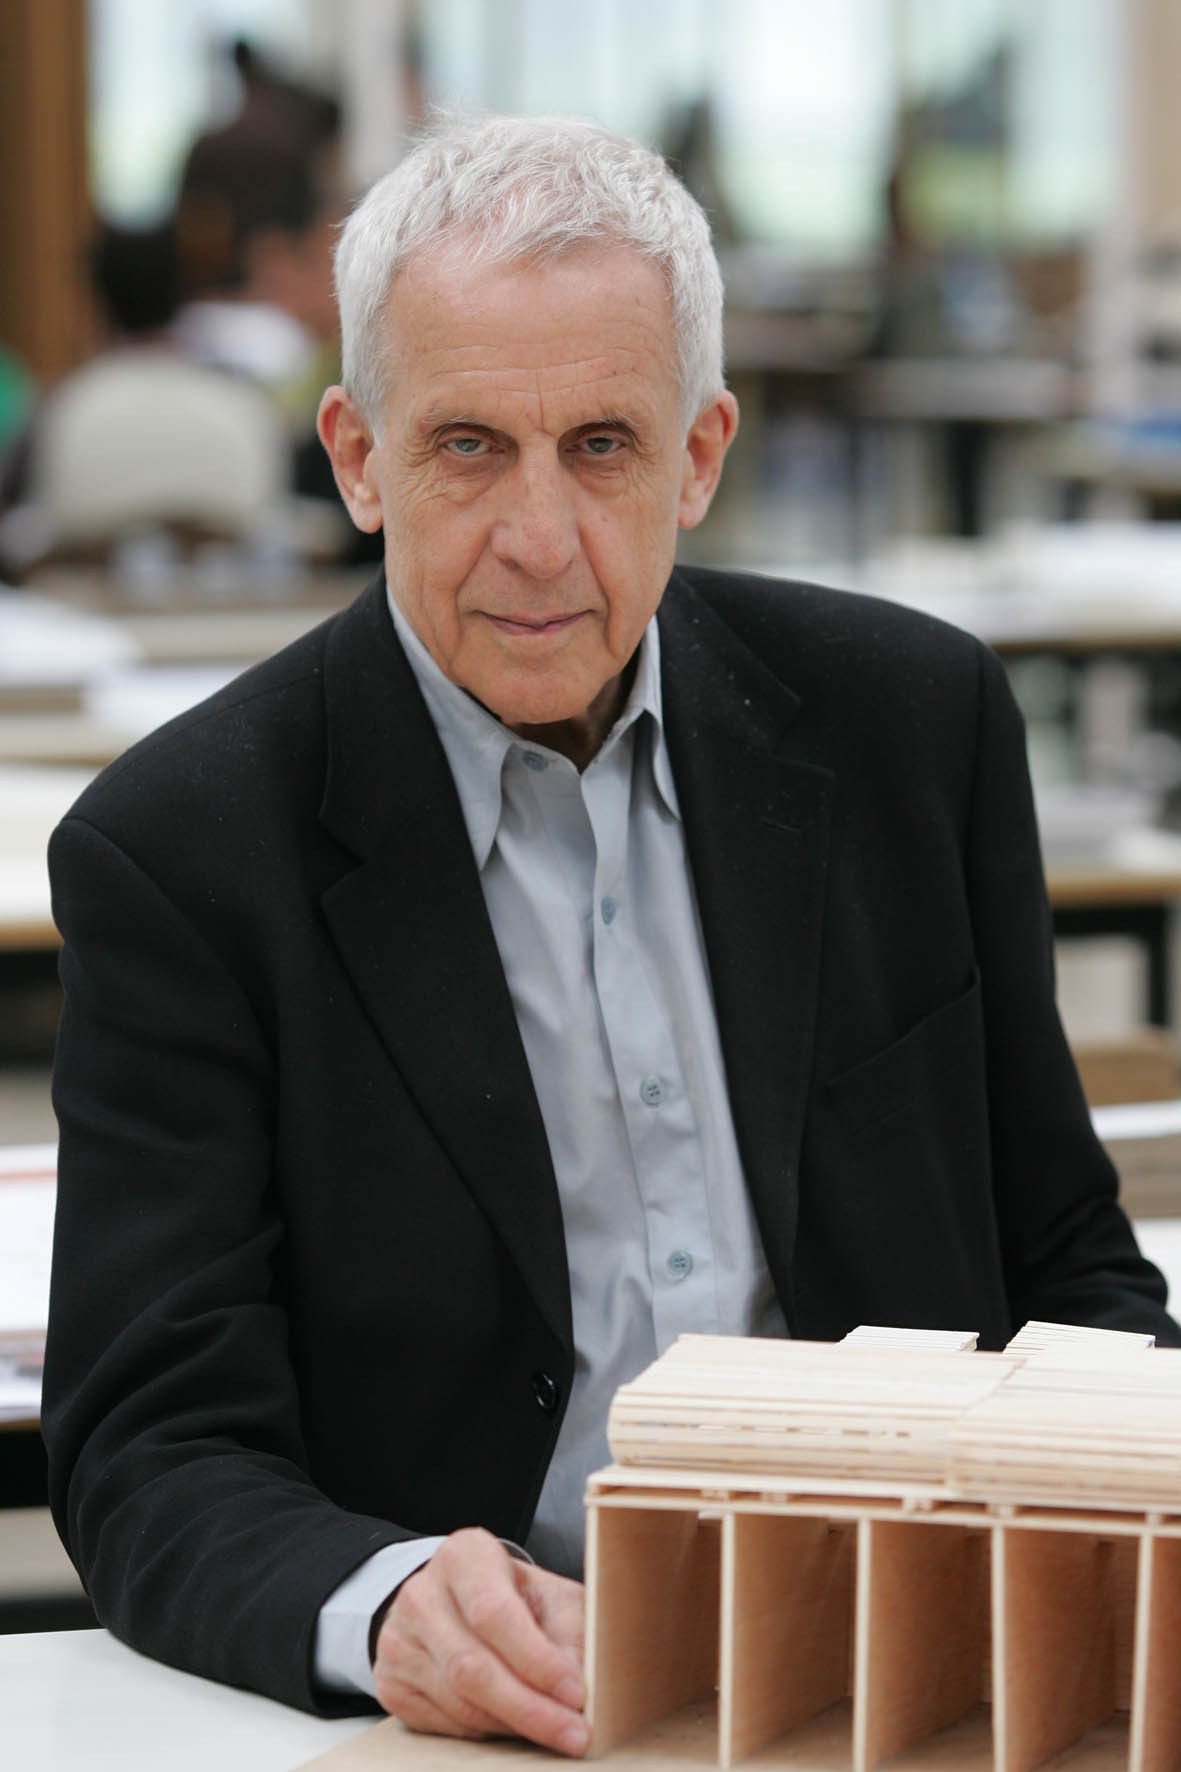 Plain Modern Architecture Kenneth Frampton Wins Lifetime Achievement Award At Lisbon Triennale And Ideas